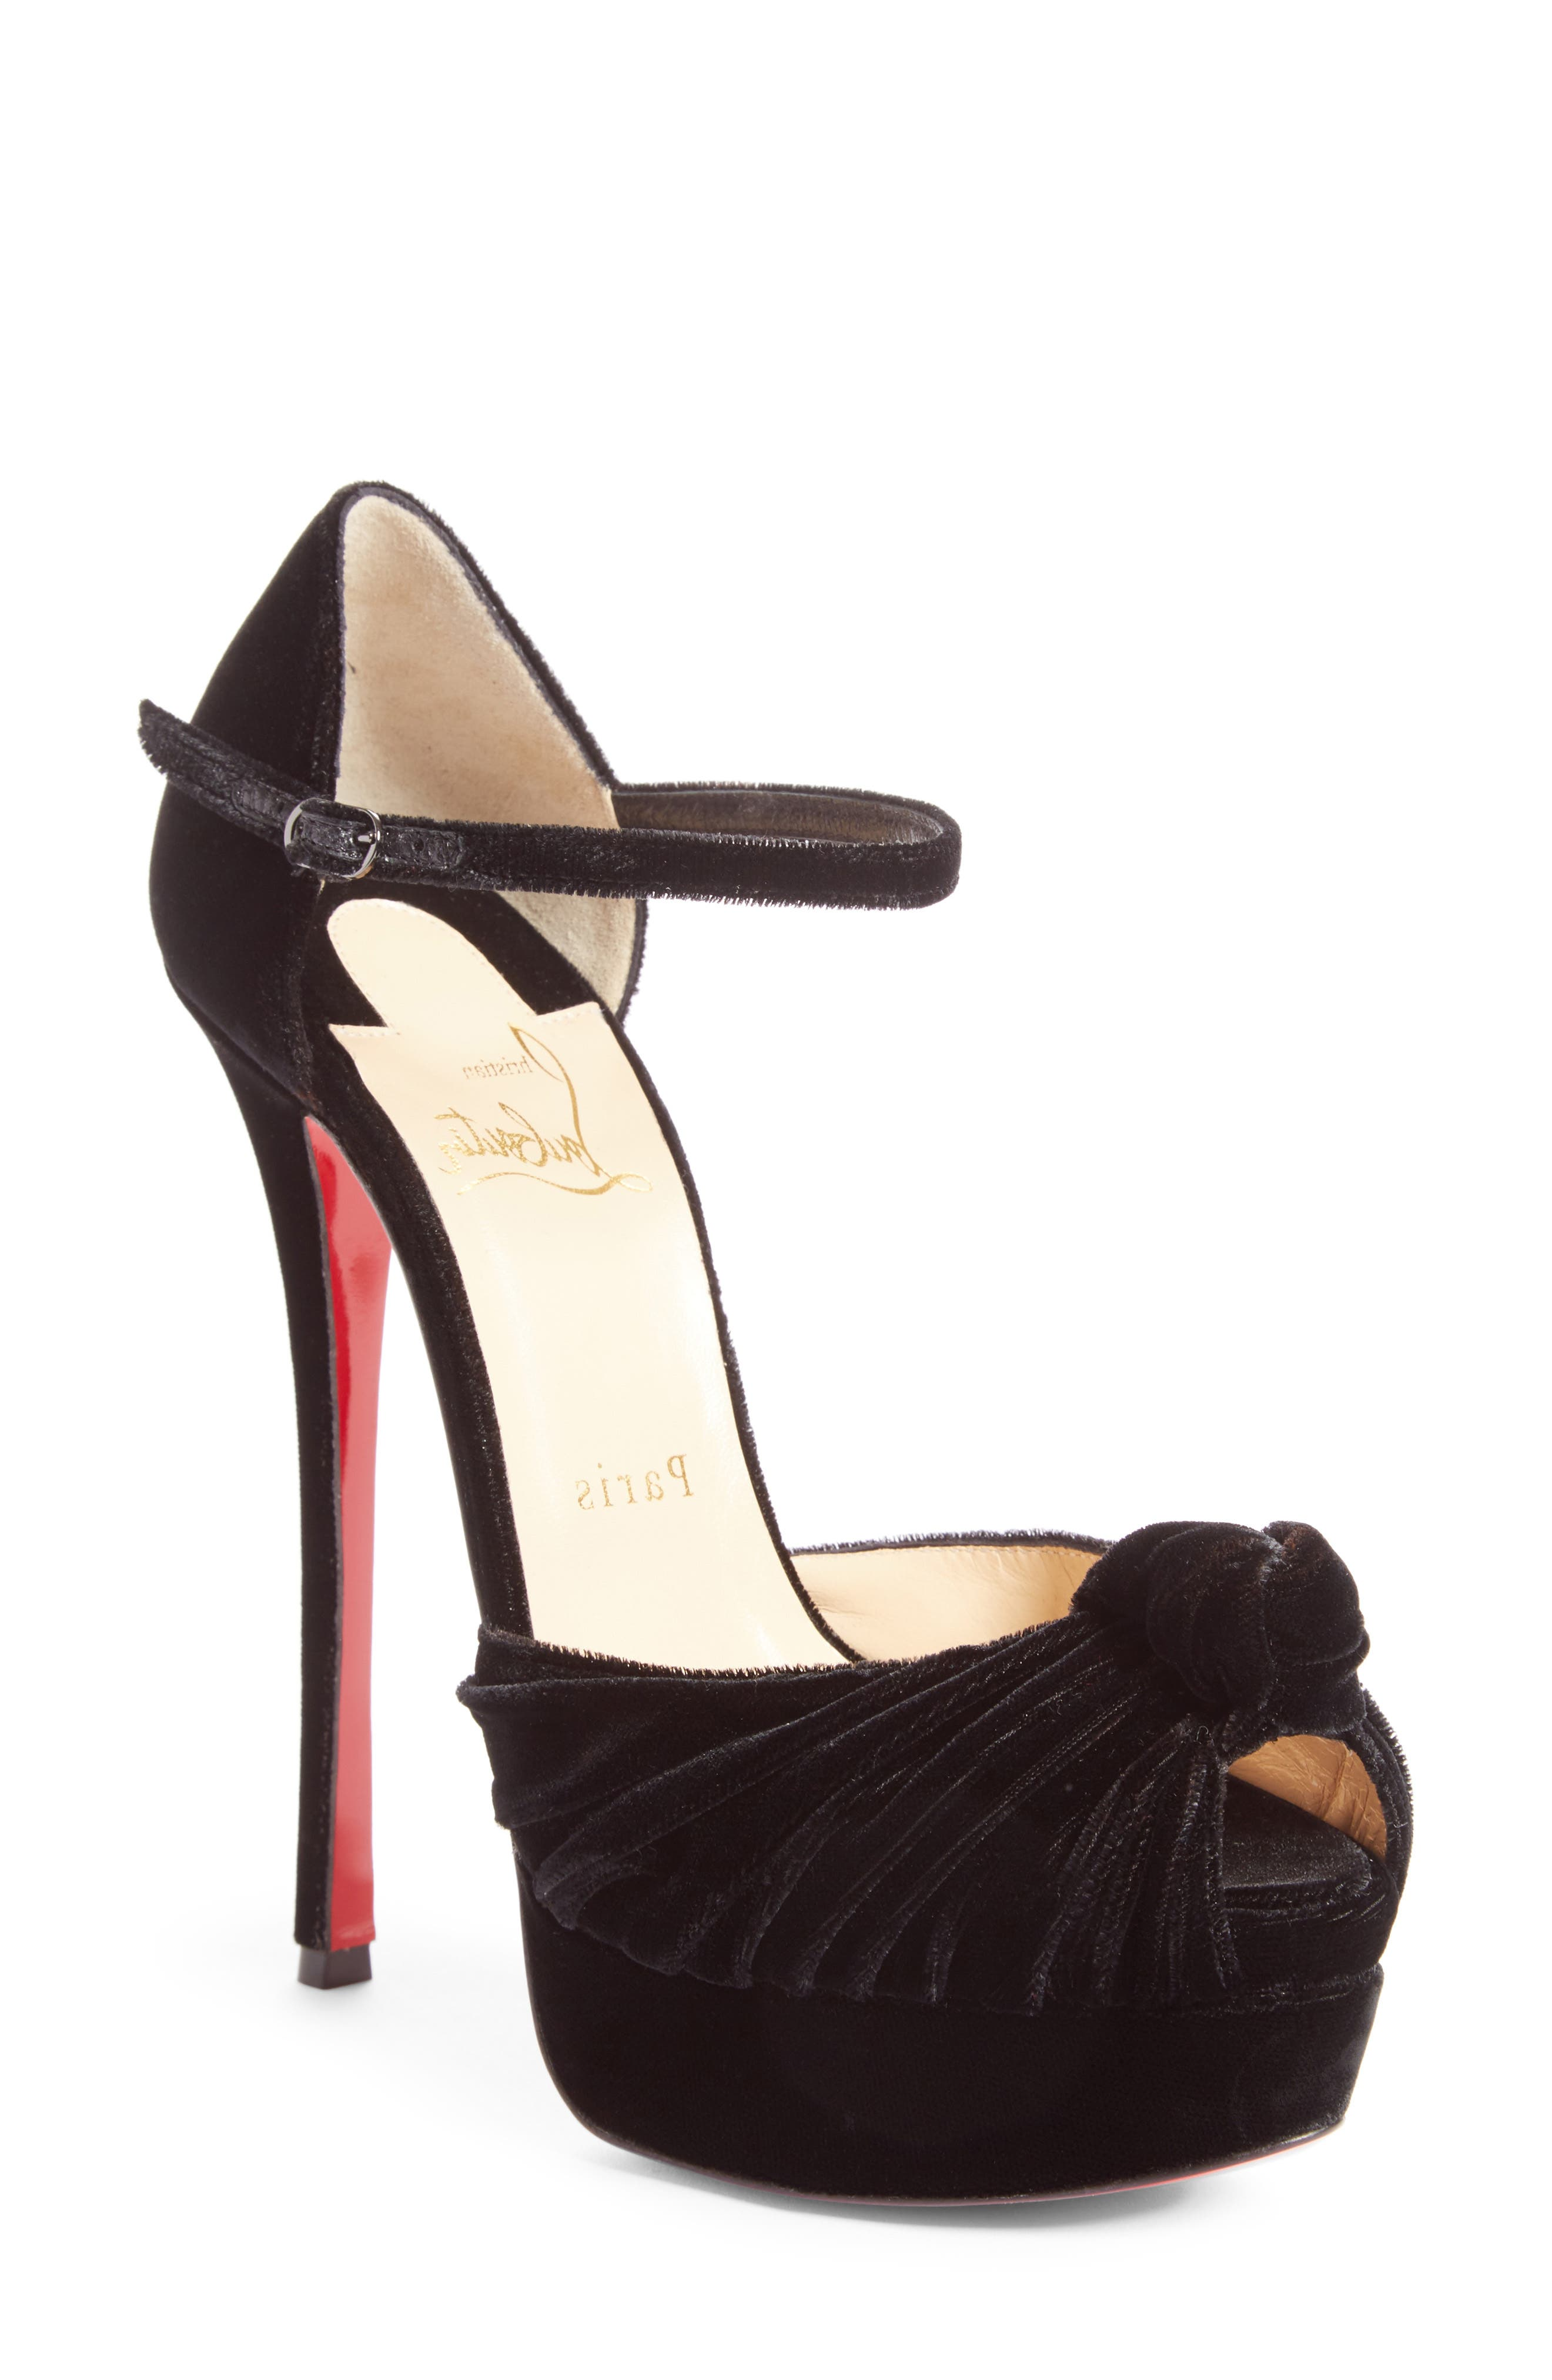 Marchavekel Ankle Strap Platform Sandal,                             Main thumbnail 1, color,                             001